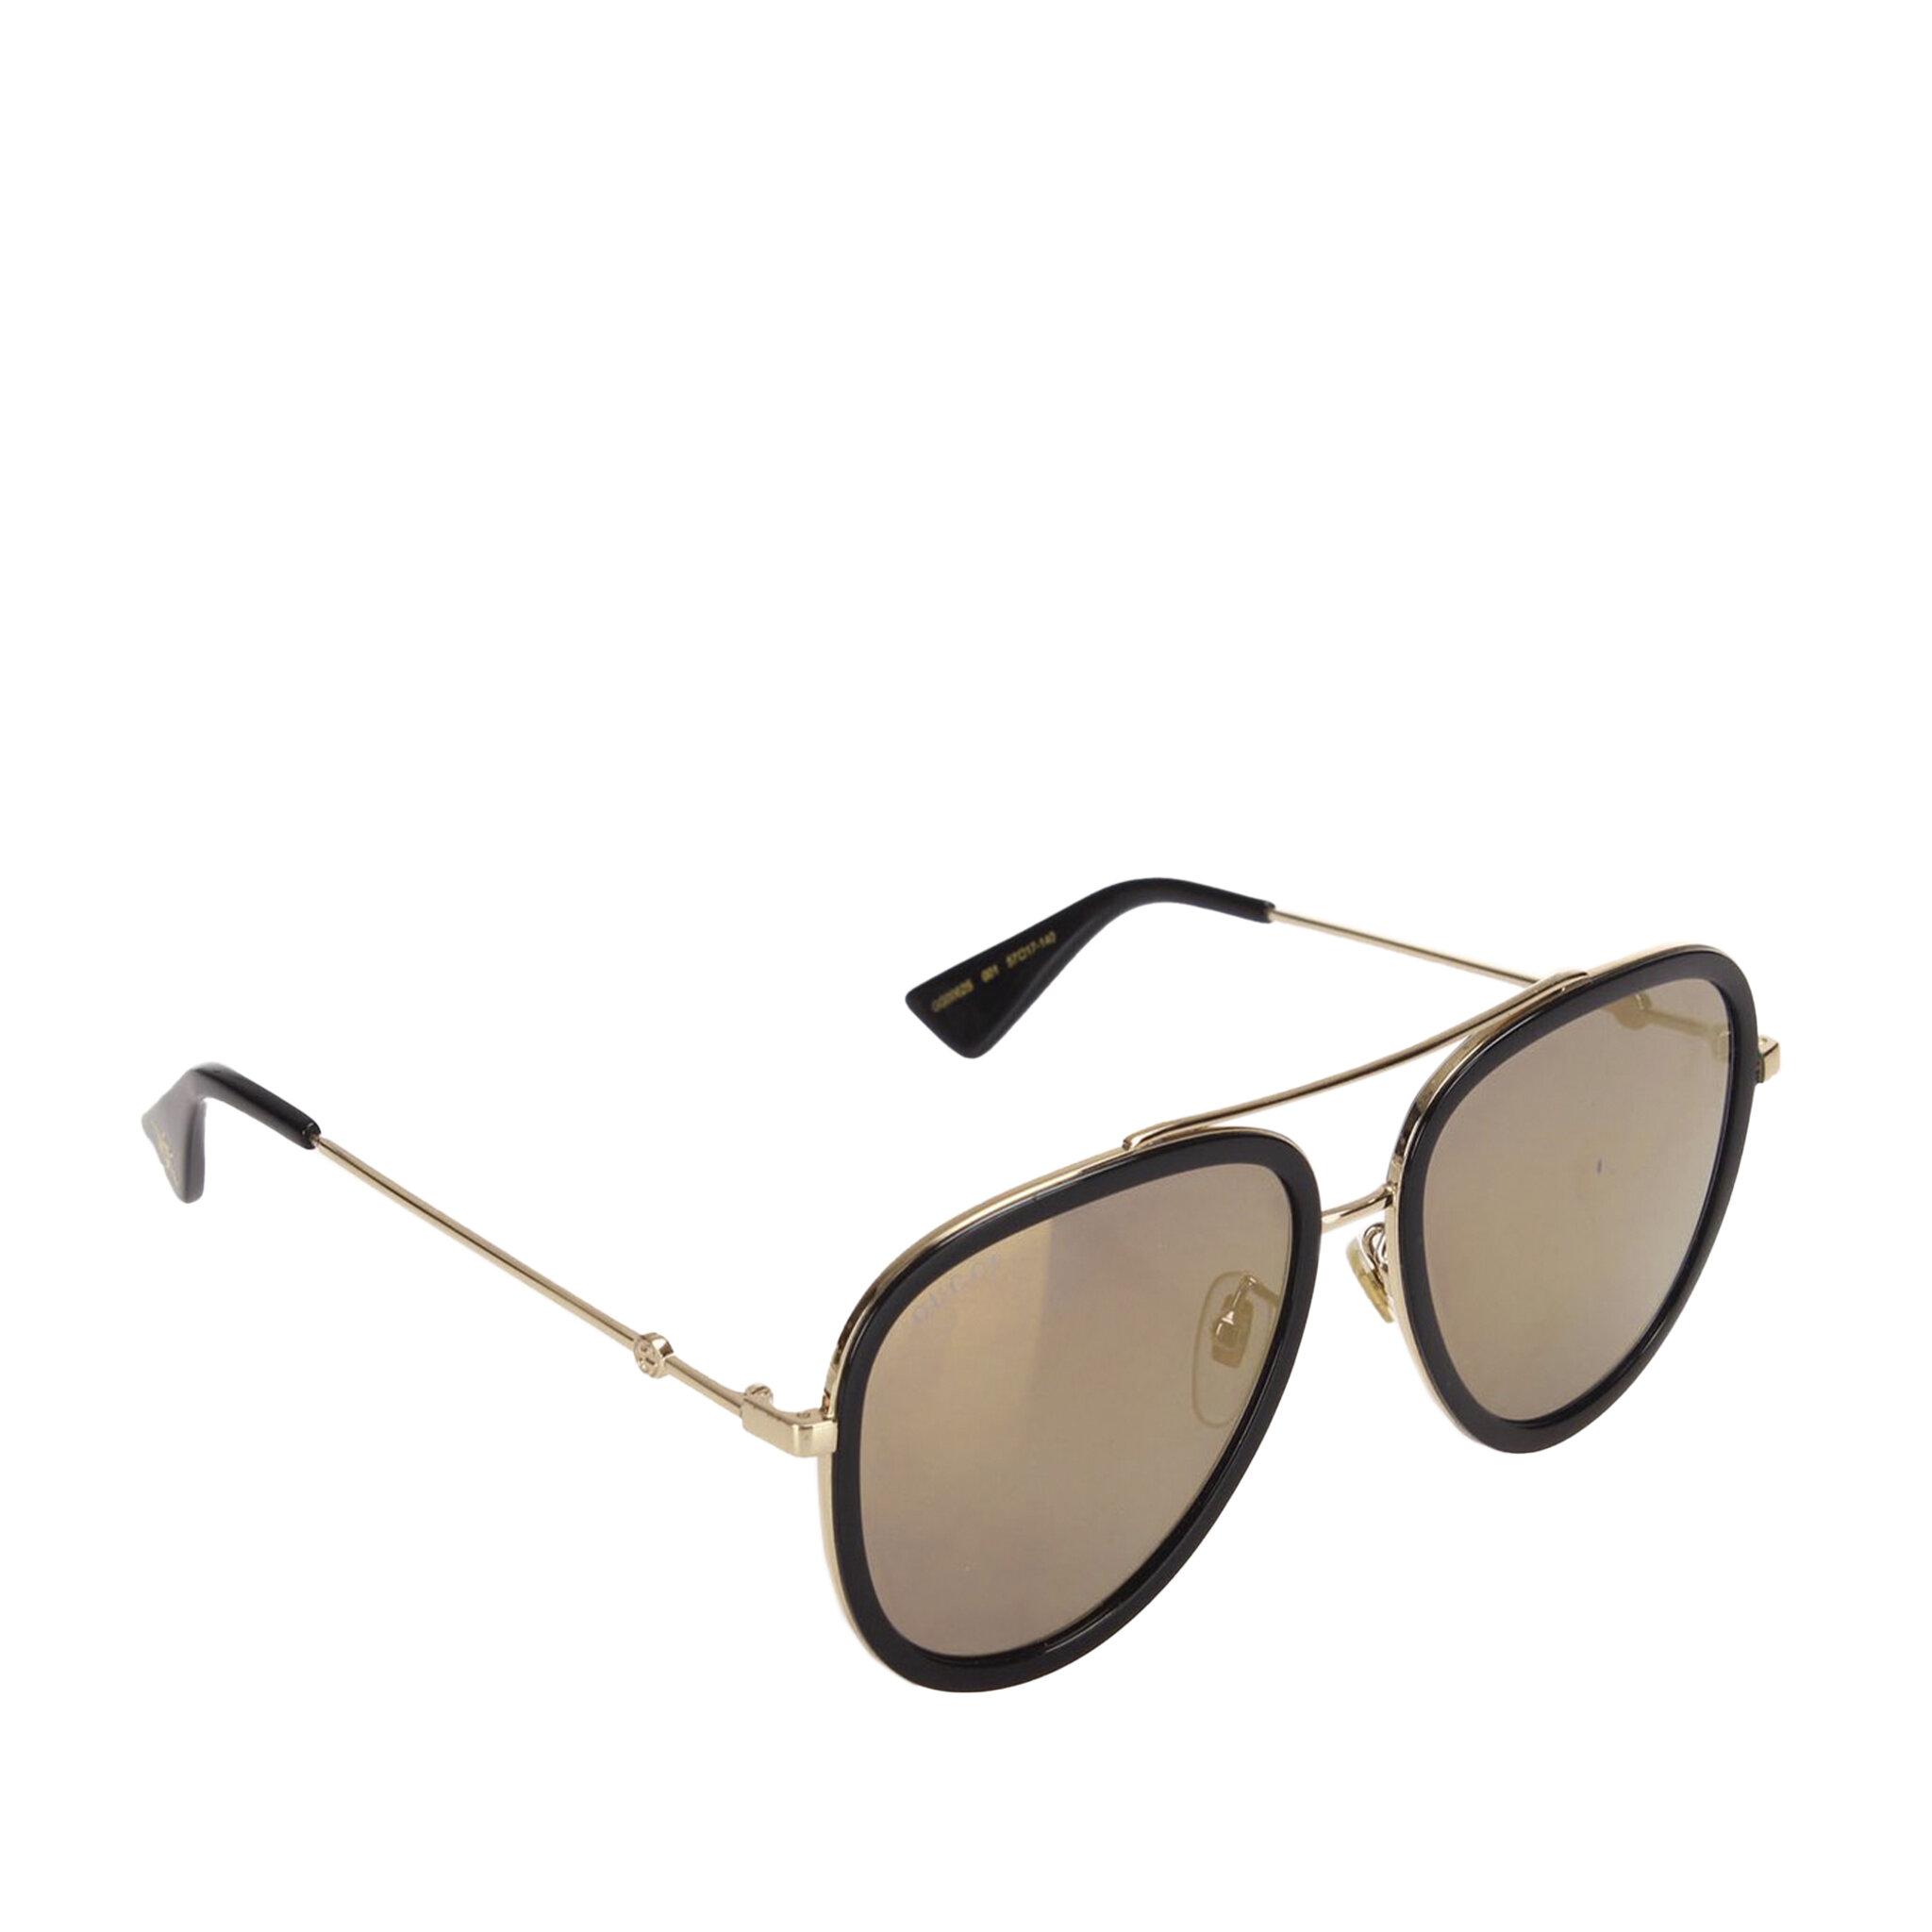 Gucci Aviator Tinted Sunglasses, ONESIZE